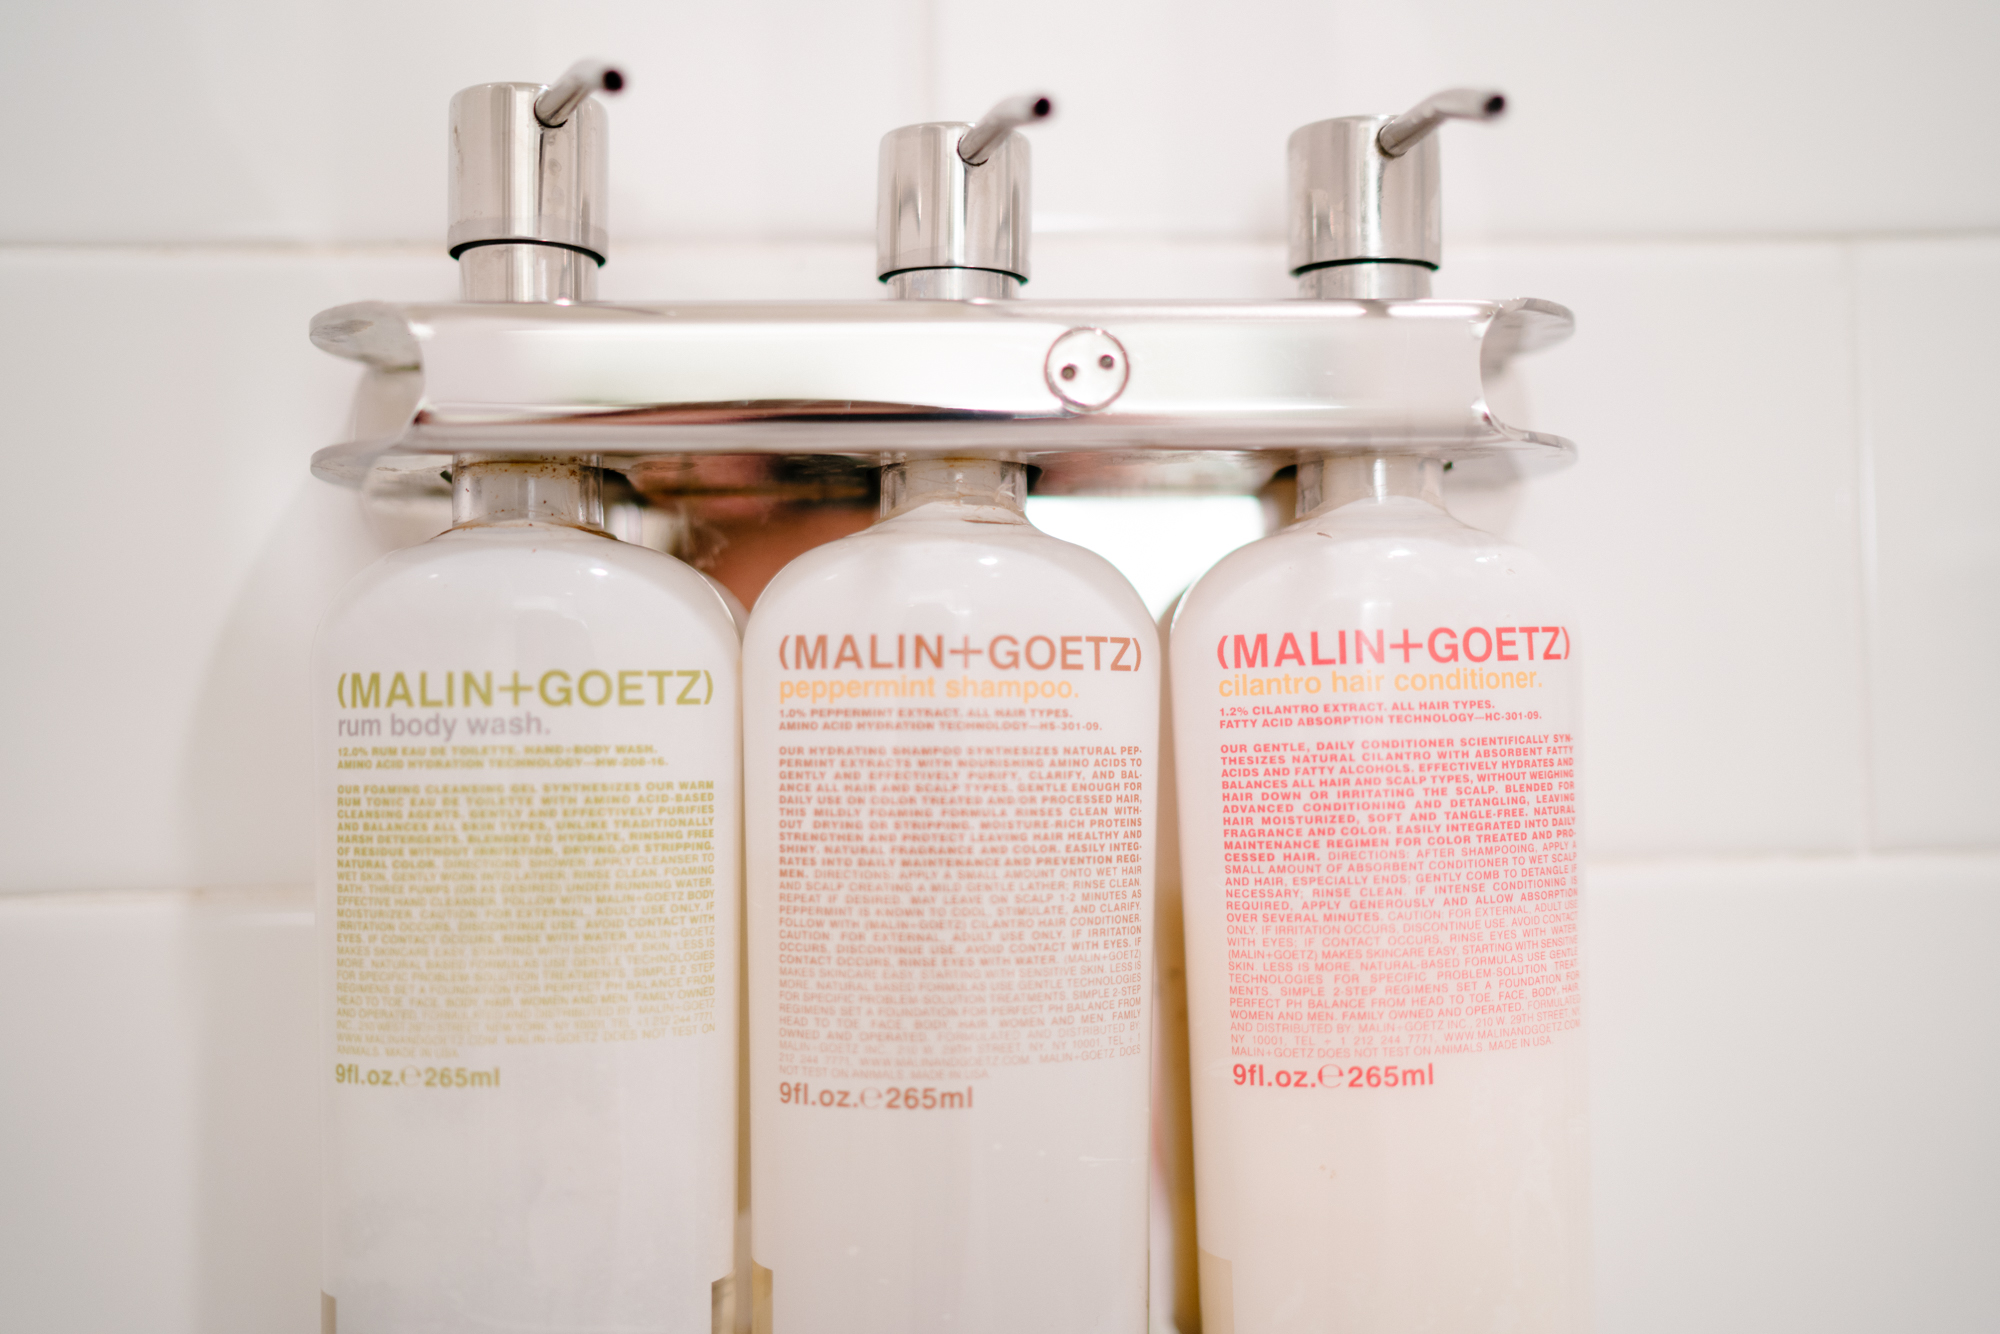 Malin + Goetz products at Zero George